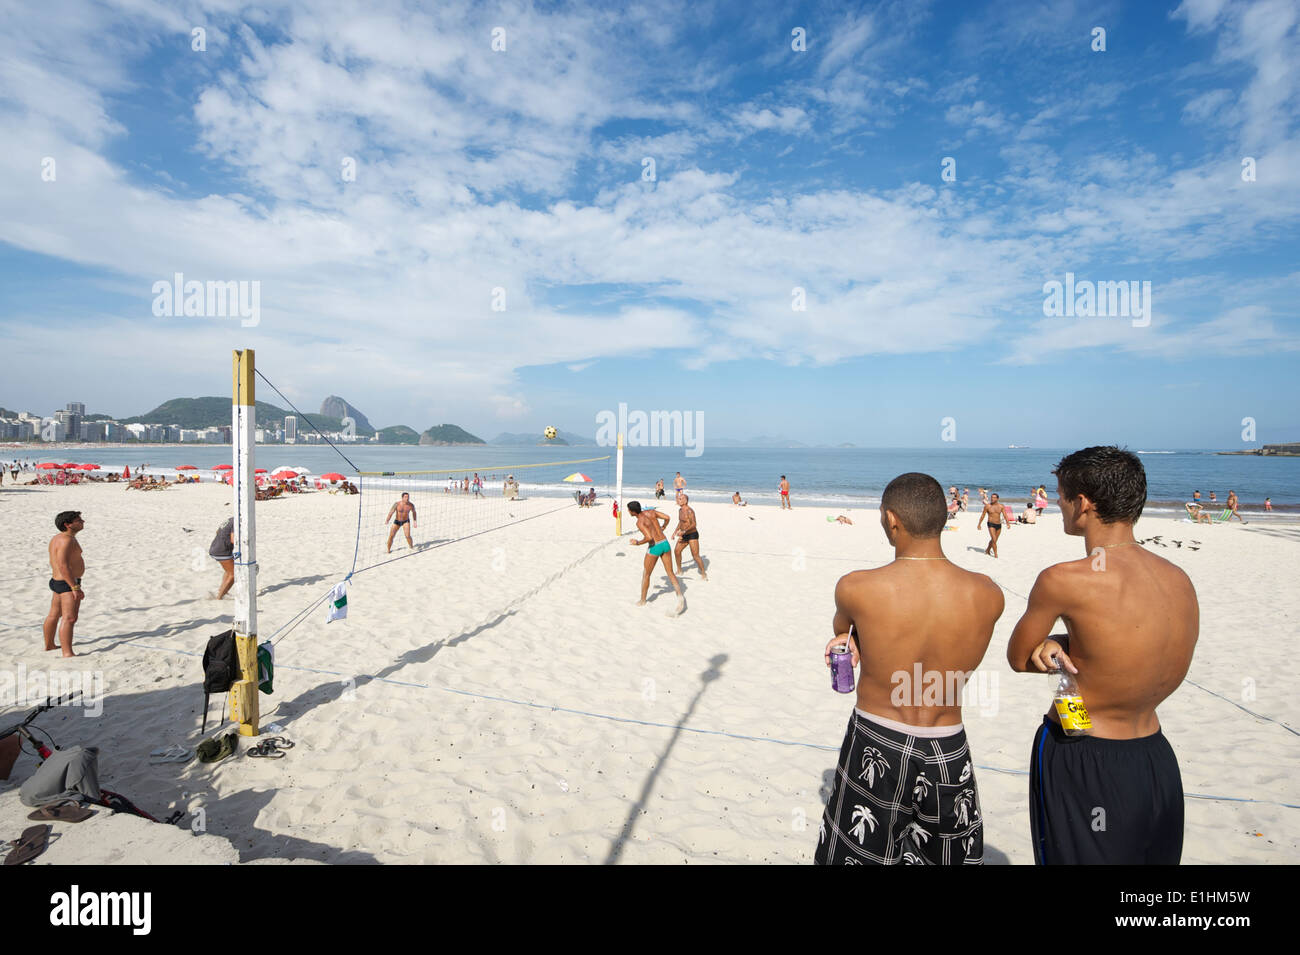 RIO DE JANEIRO, Brésil - Janvier 2011: jeunes hommes regarder un match de footvolley, un sport du football et volley-ball. Banque D'Images